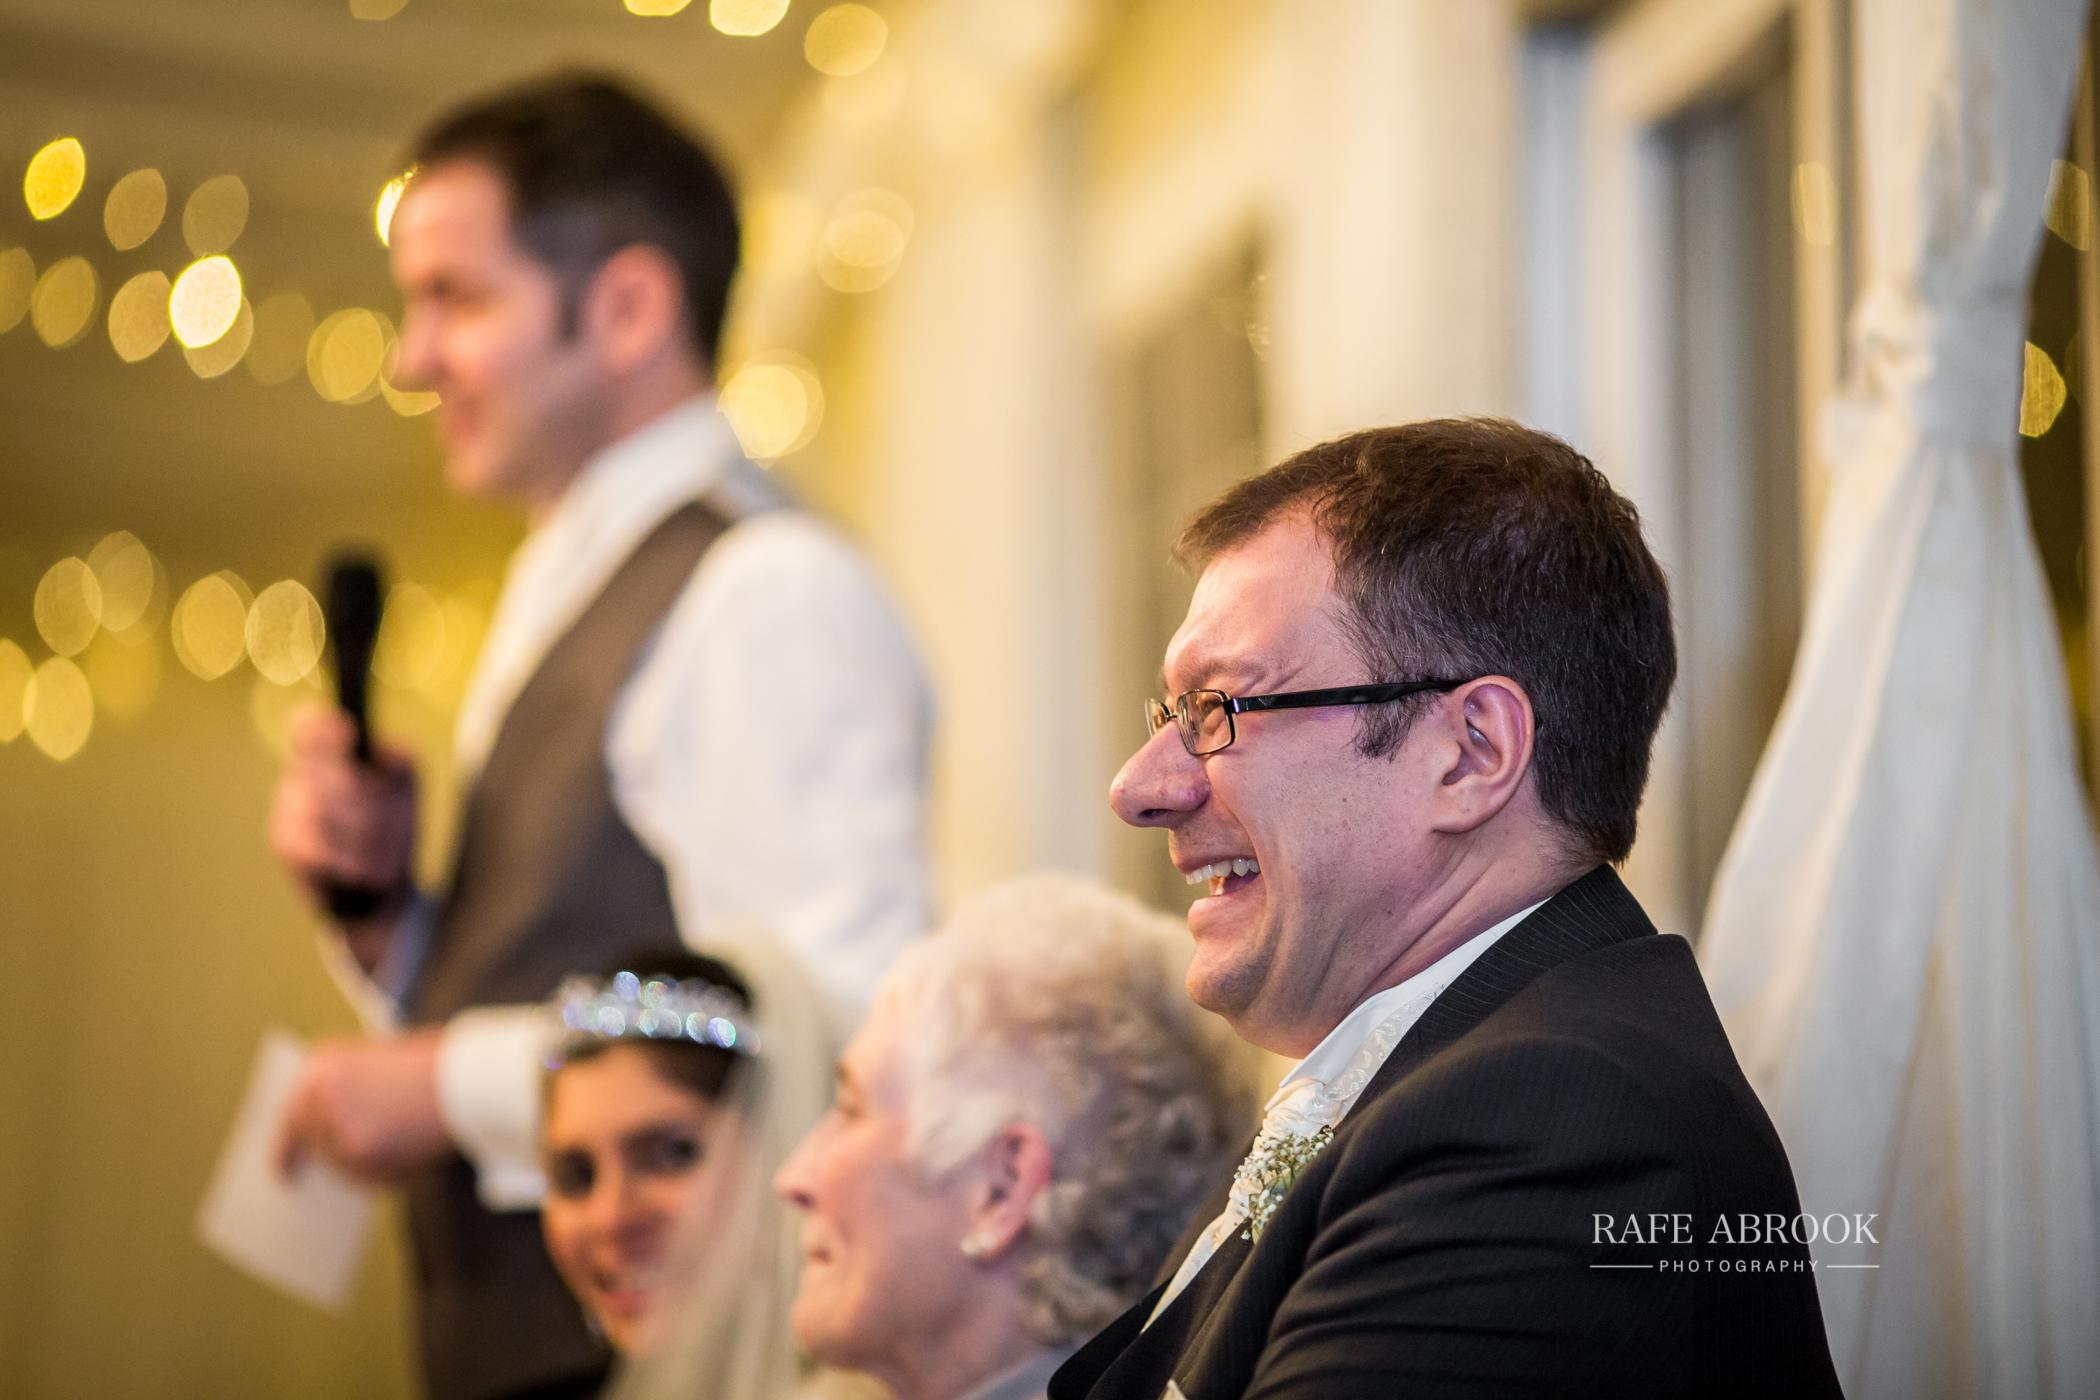 roma & pete wedding hampstead shenley hertfordshire -419.jpg